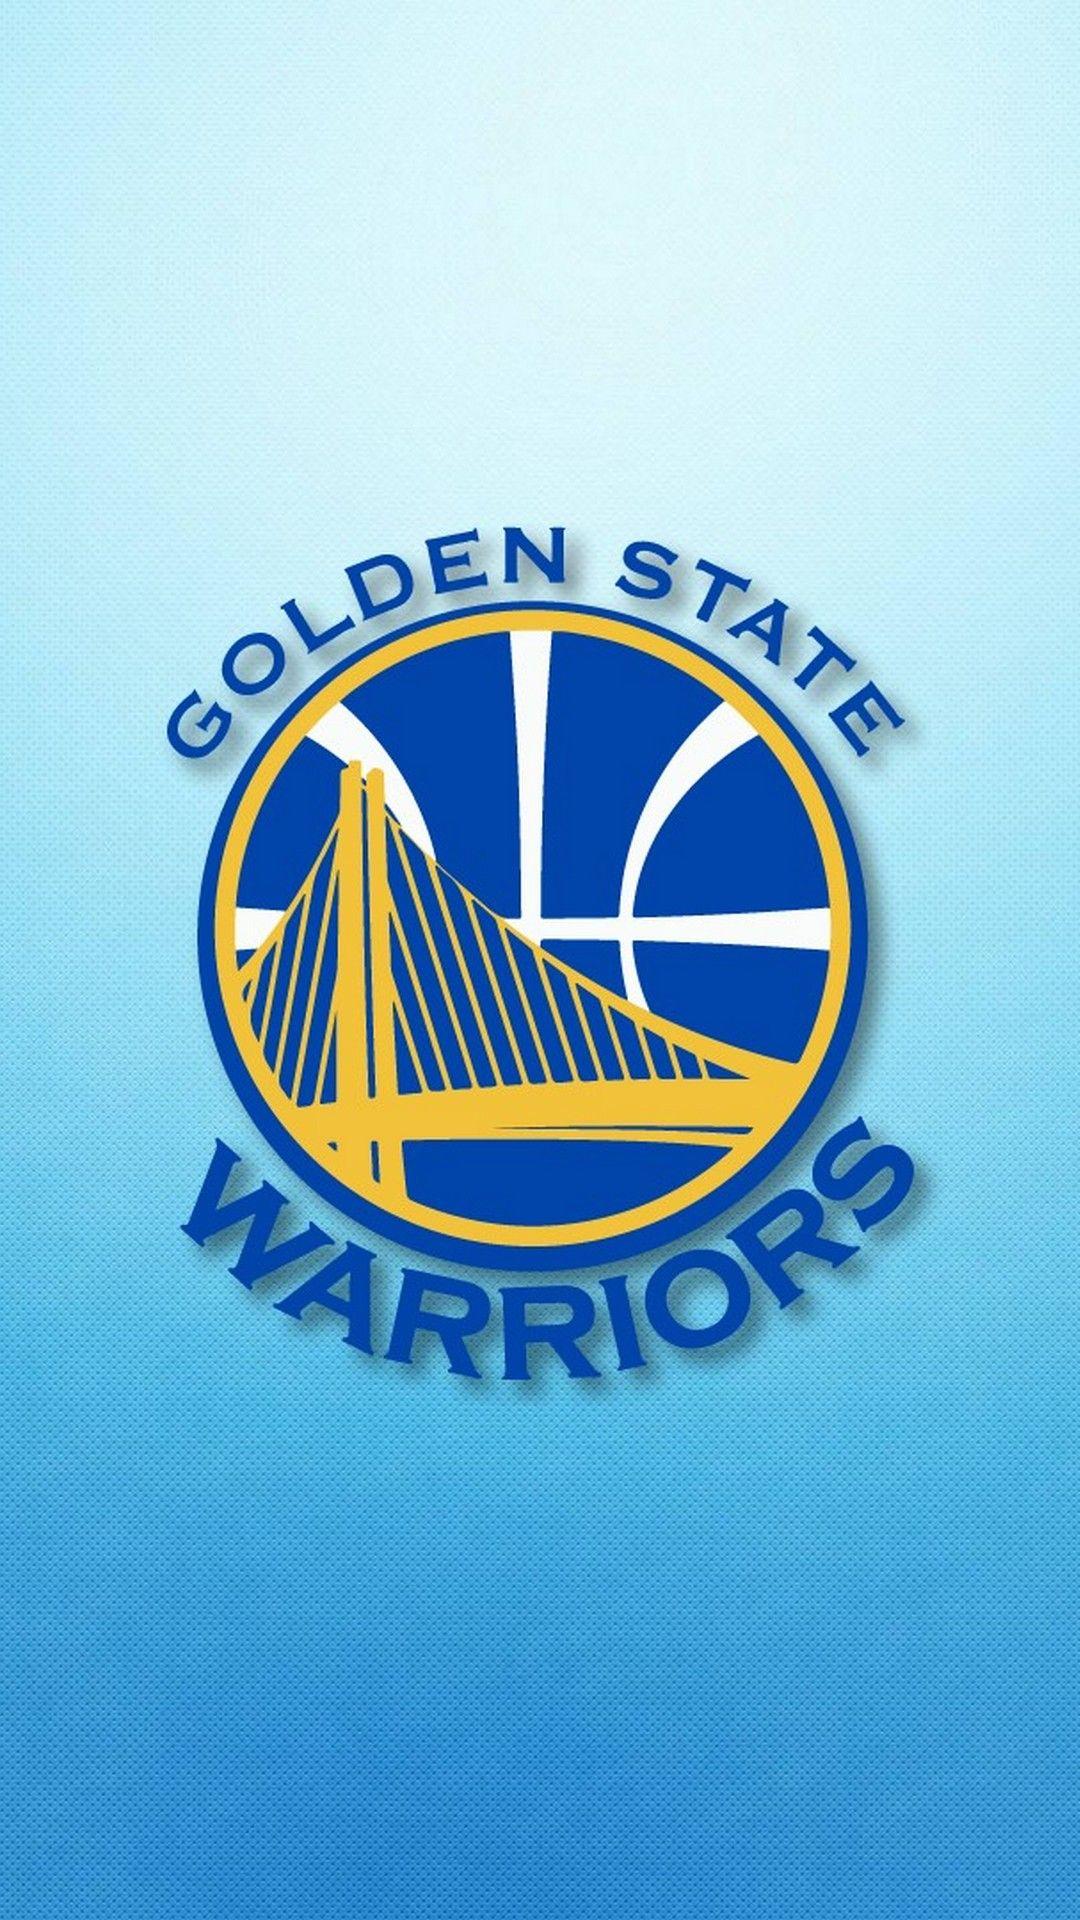 Wallpaper Golden State Warriors Android - Best Mobile Wallpaper